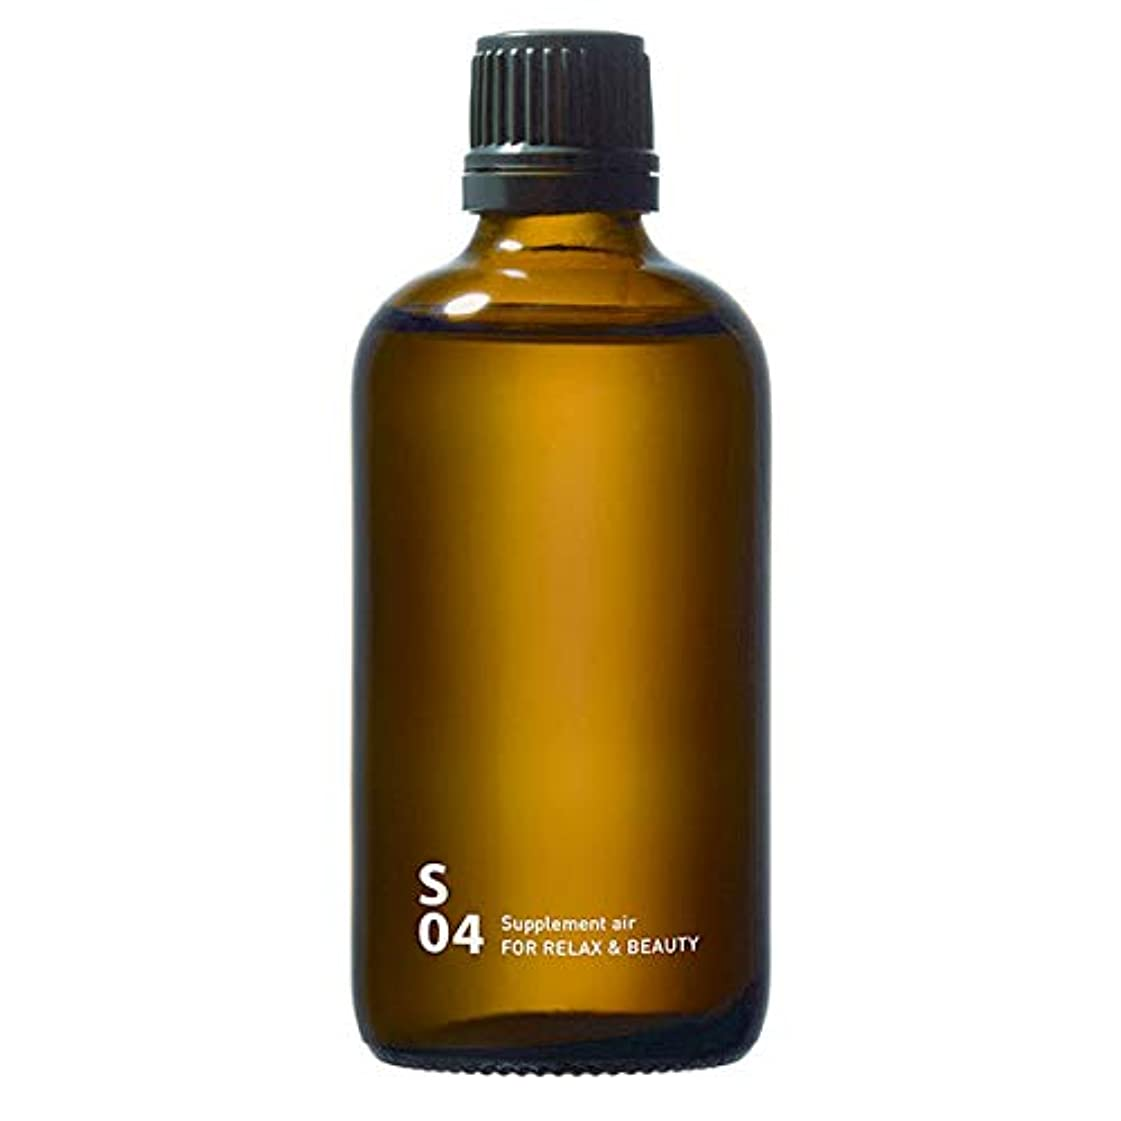 親指実用的子供時代S04 FOR RELAX & BEAUTY piezo aroma oil 100ml